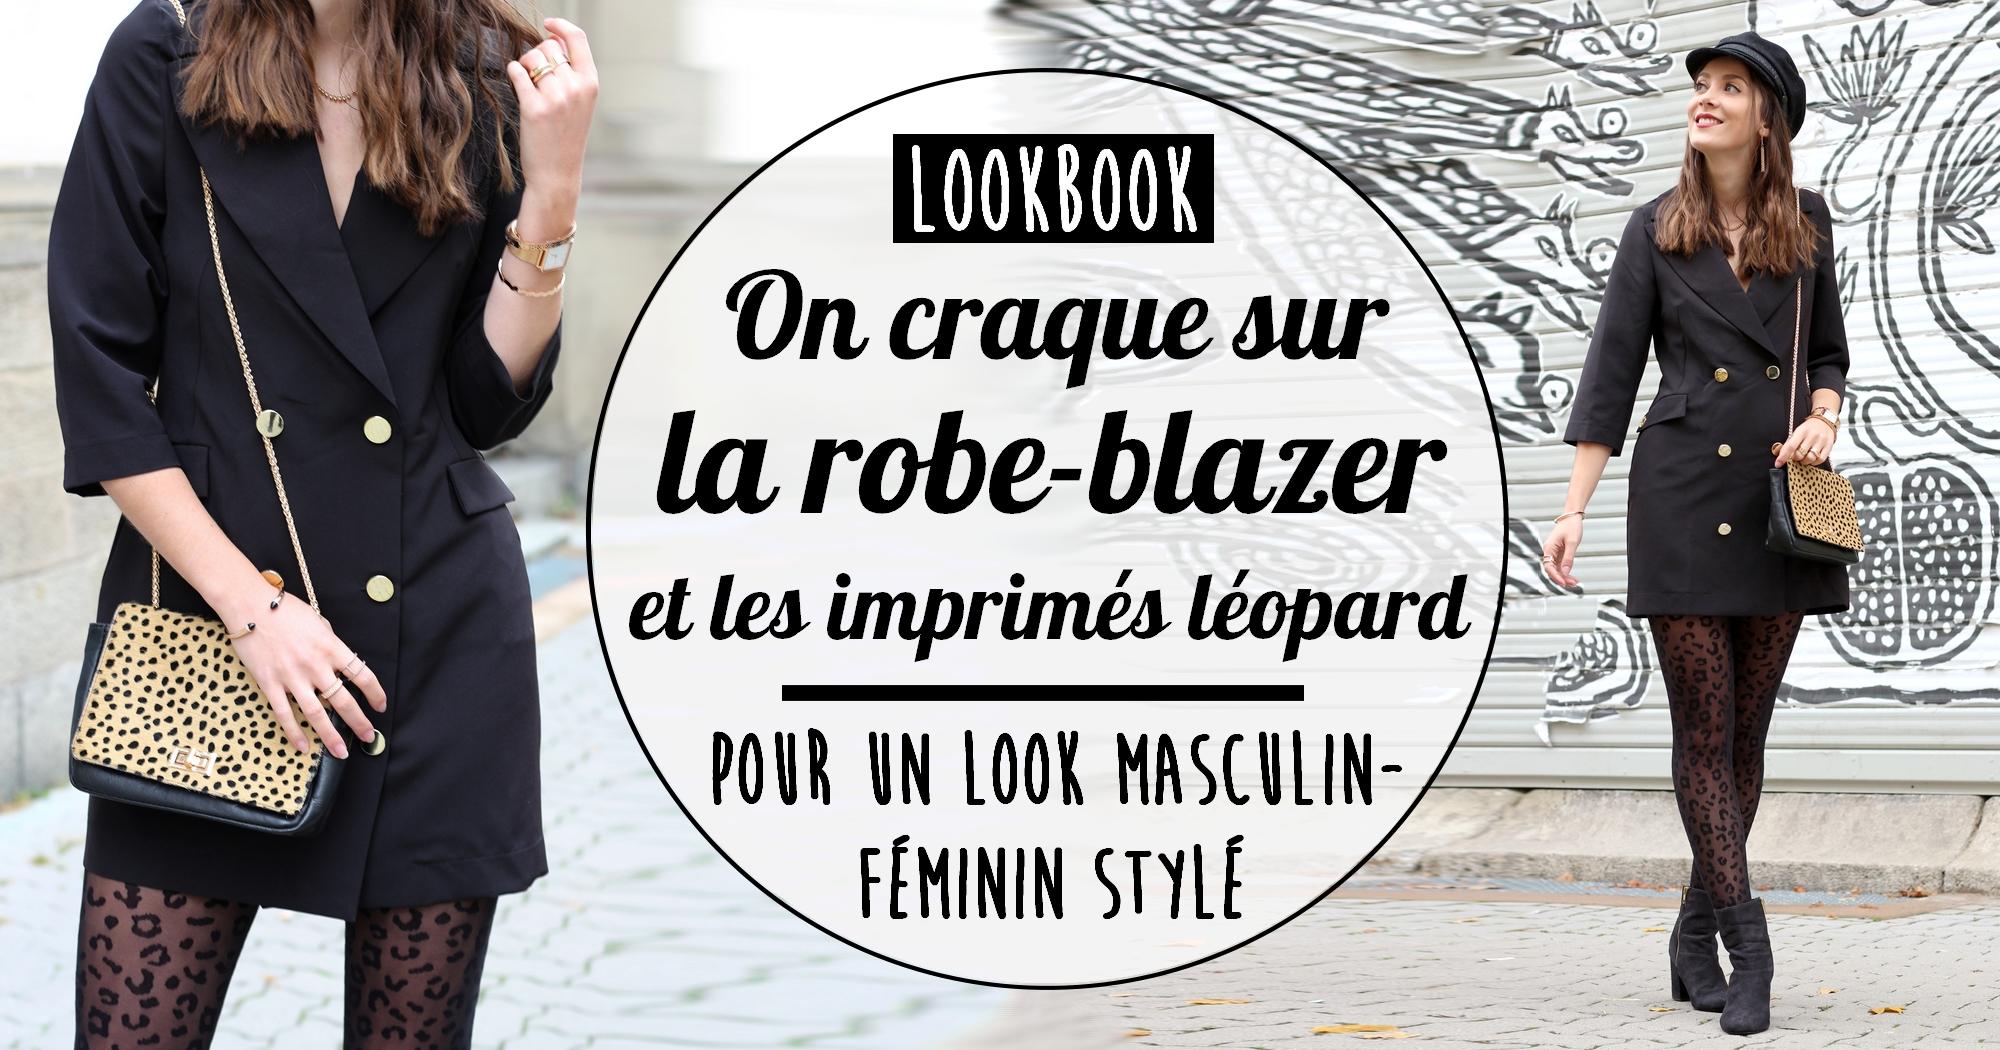 Look masculin féminin : la robe blazer et l'imprimé léopard